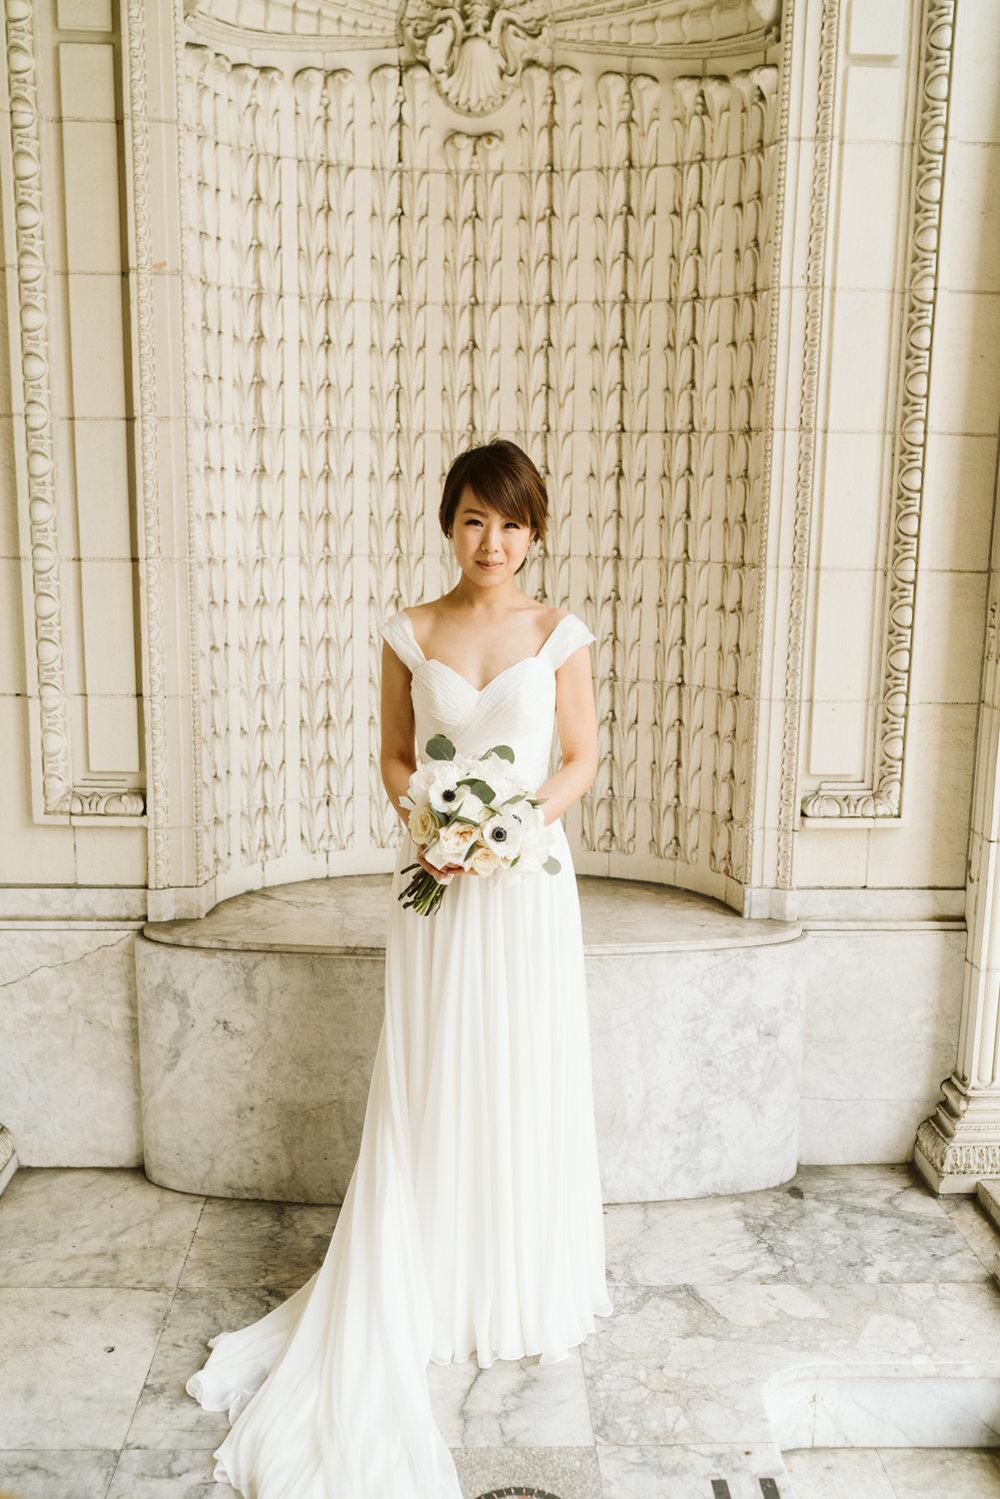 April Yentas Photography - Kristen & Jeff Wedding-21.jpg